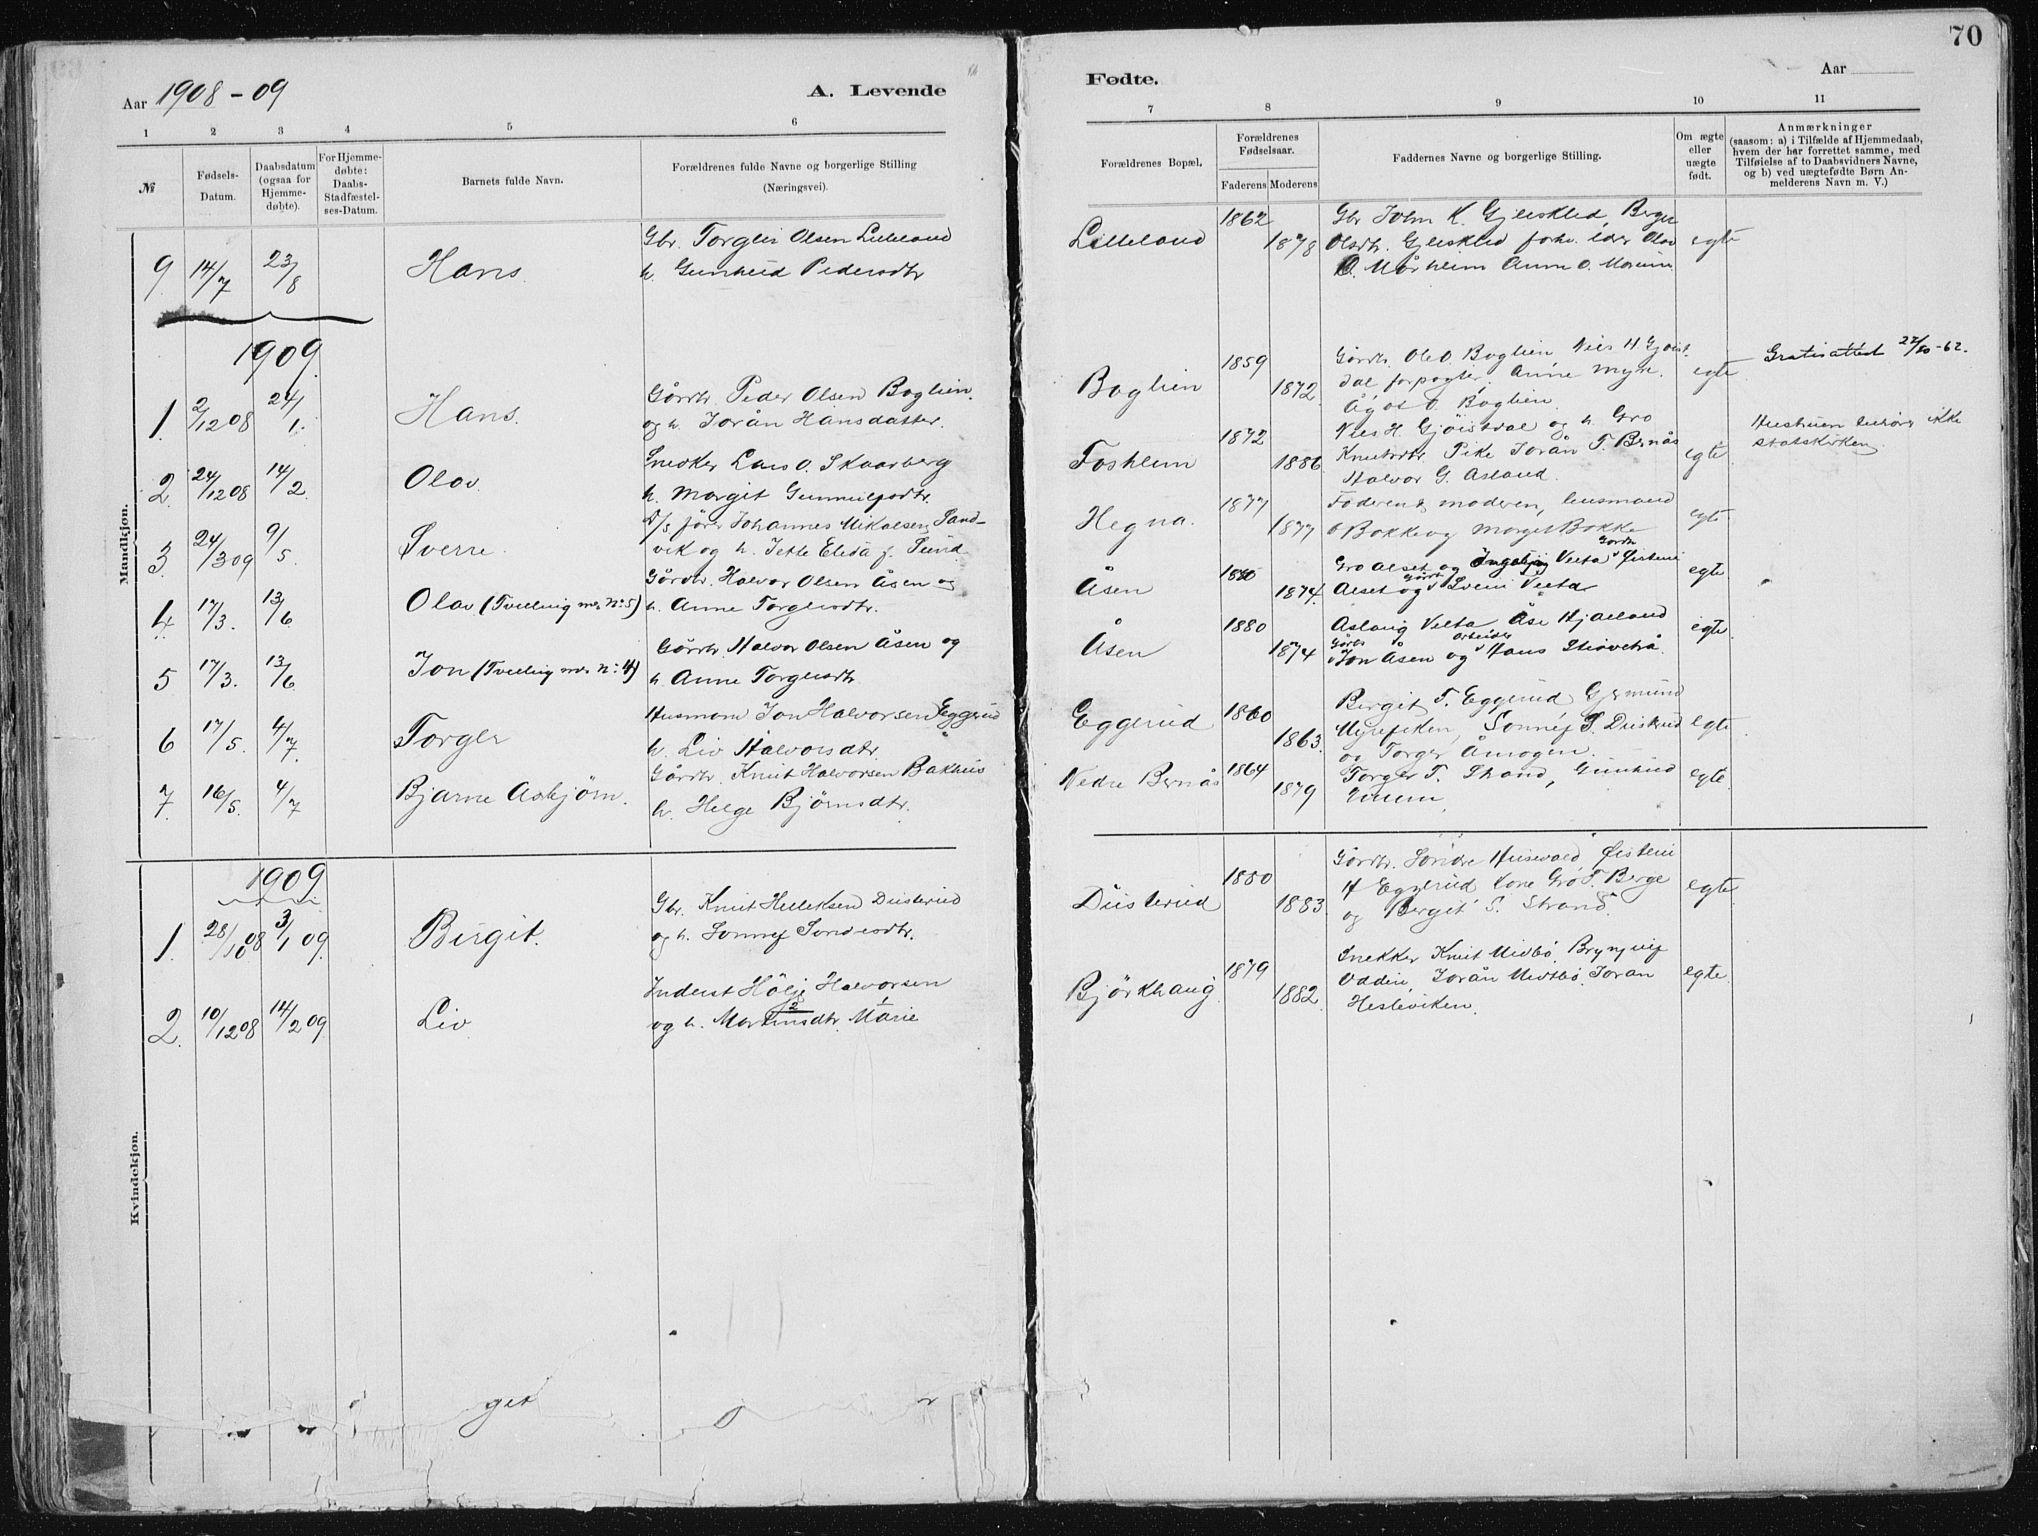 SAKO, Tinn kirkebøker, F/Fa/L0007: Ministerialbok nr. I 7, 1878-1922, s. 70